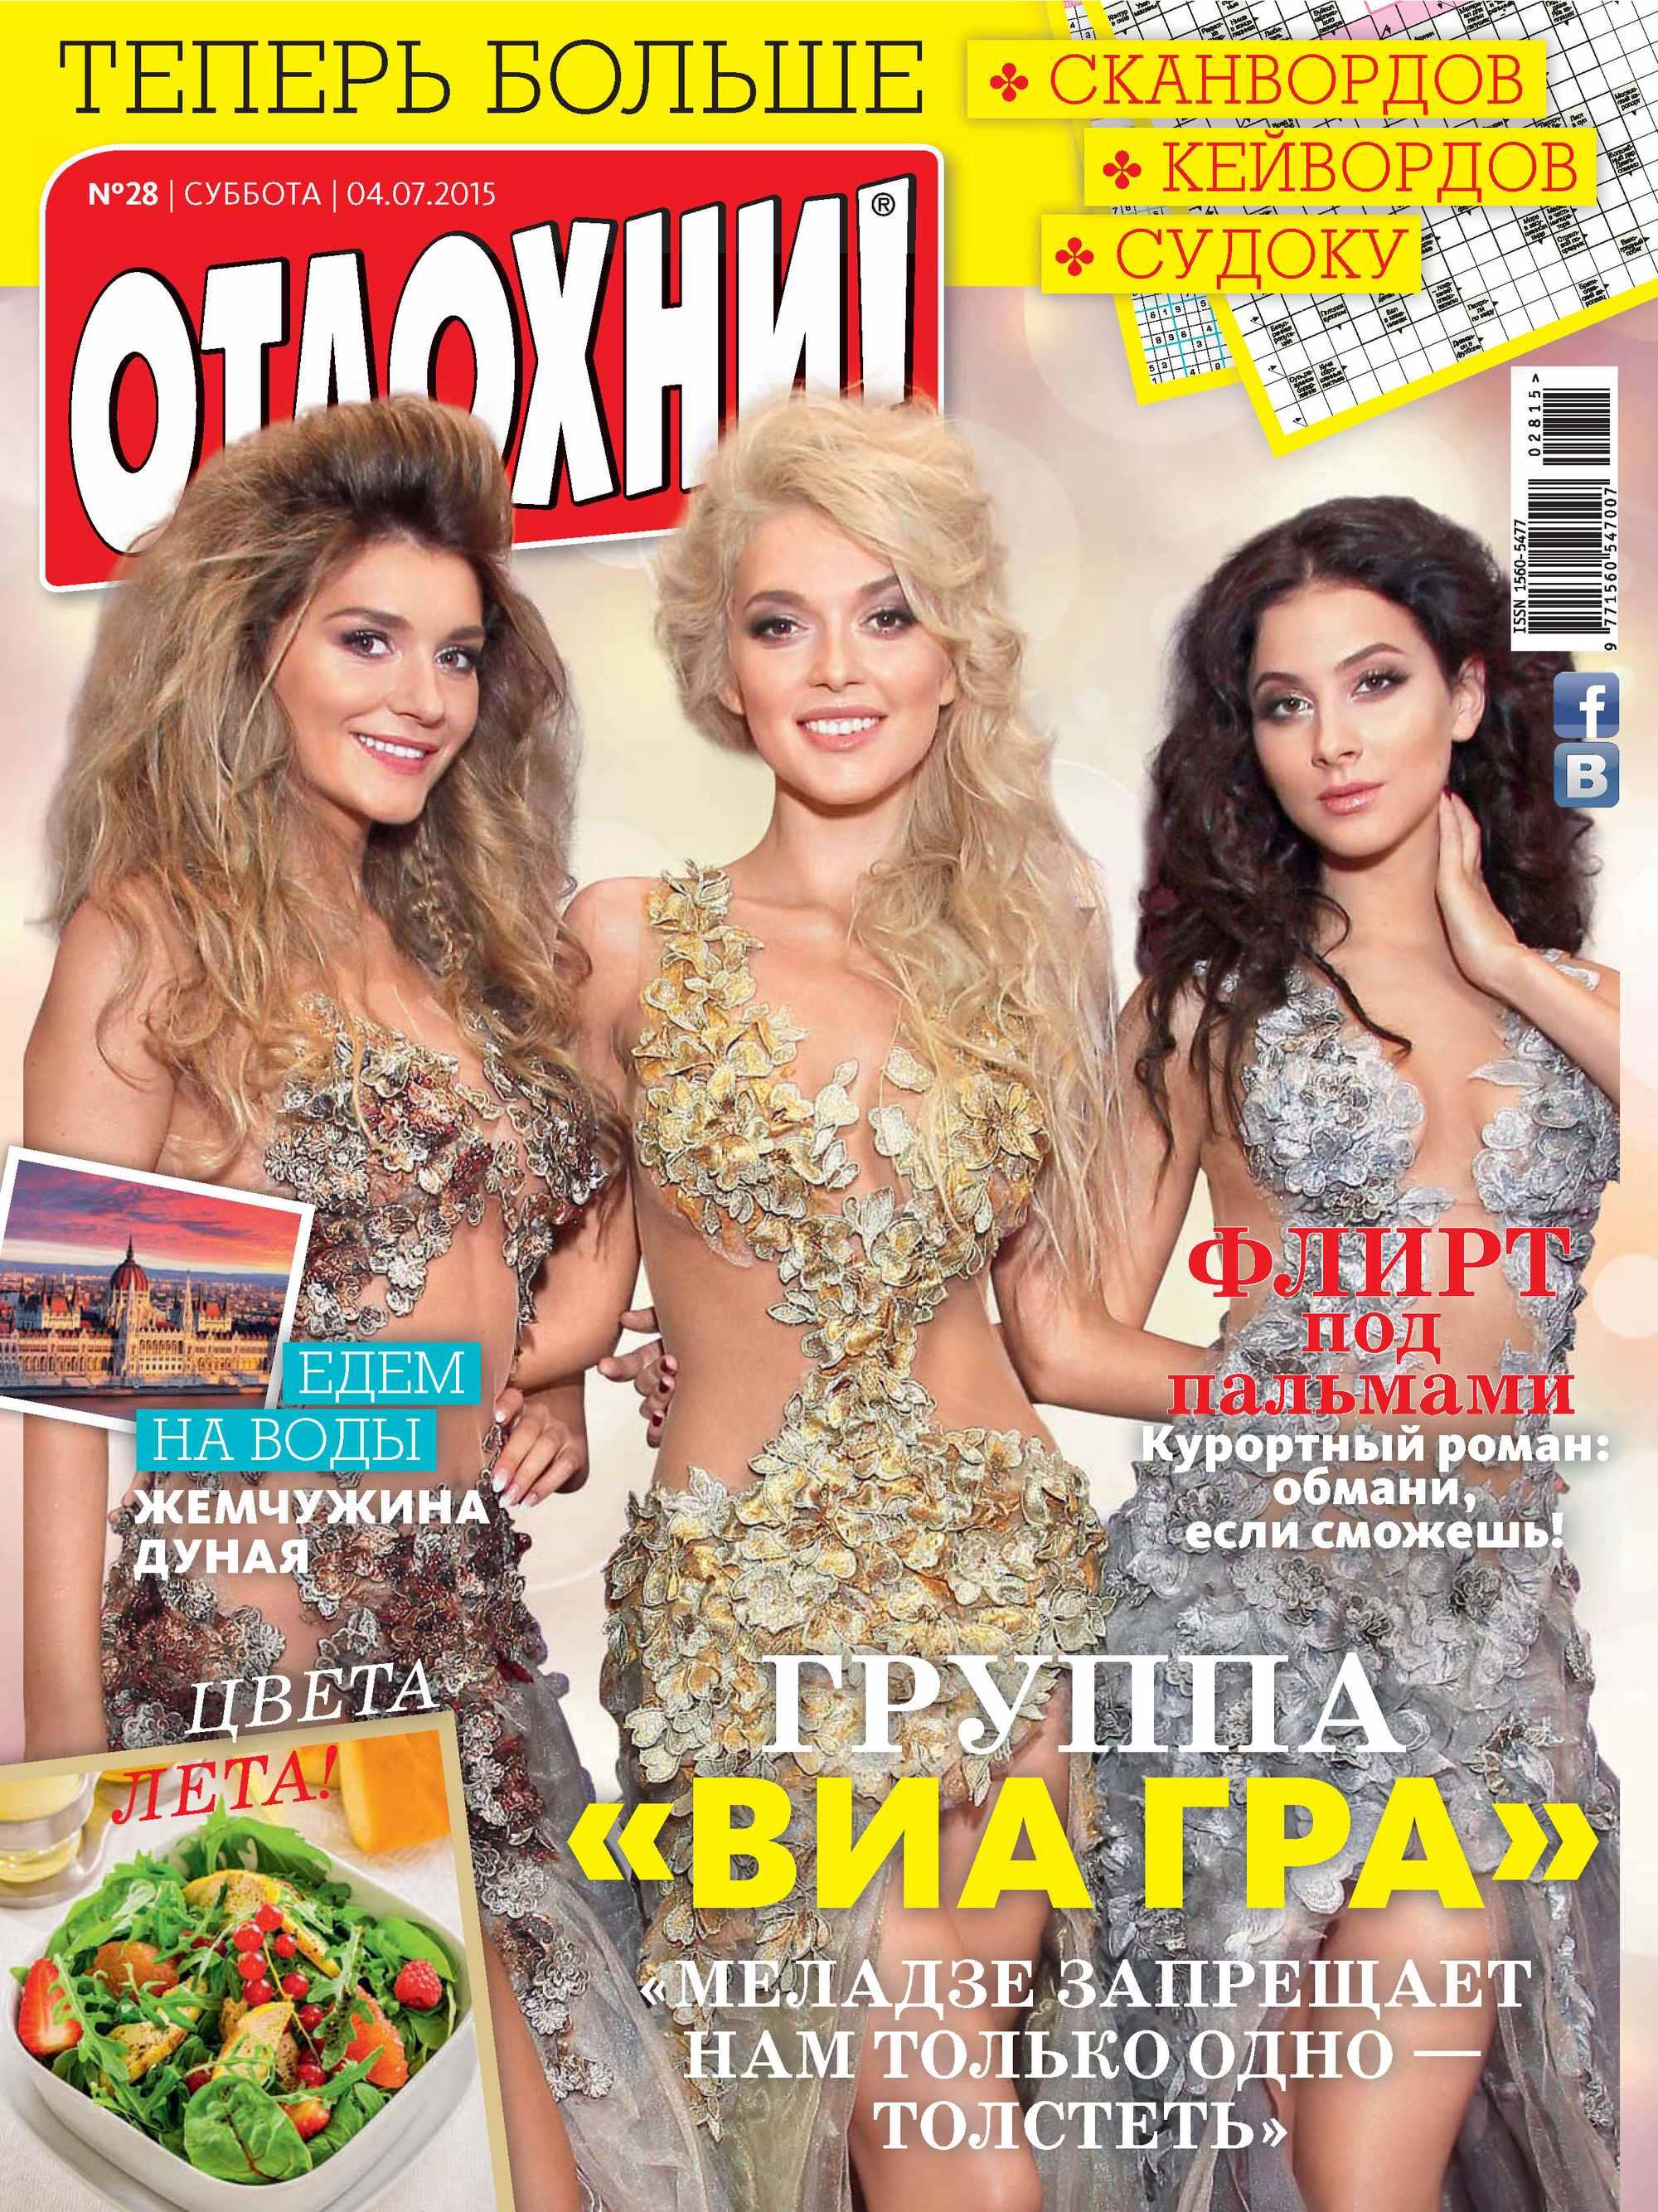 ИД «Бурда» Журнал «Отдохни!» №28/2015 ид бурда журнал отдохни 07 2015